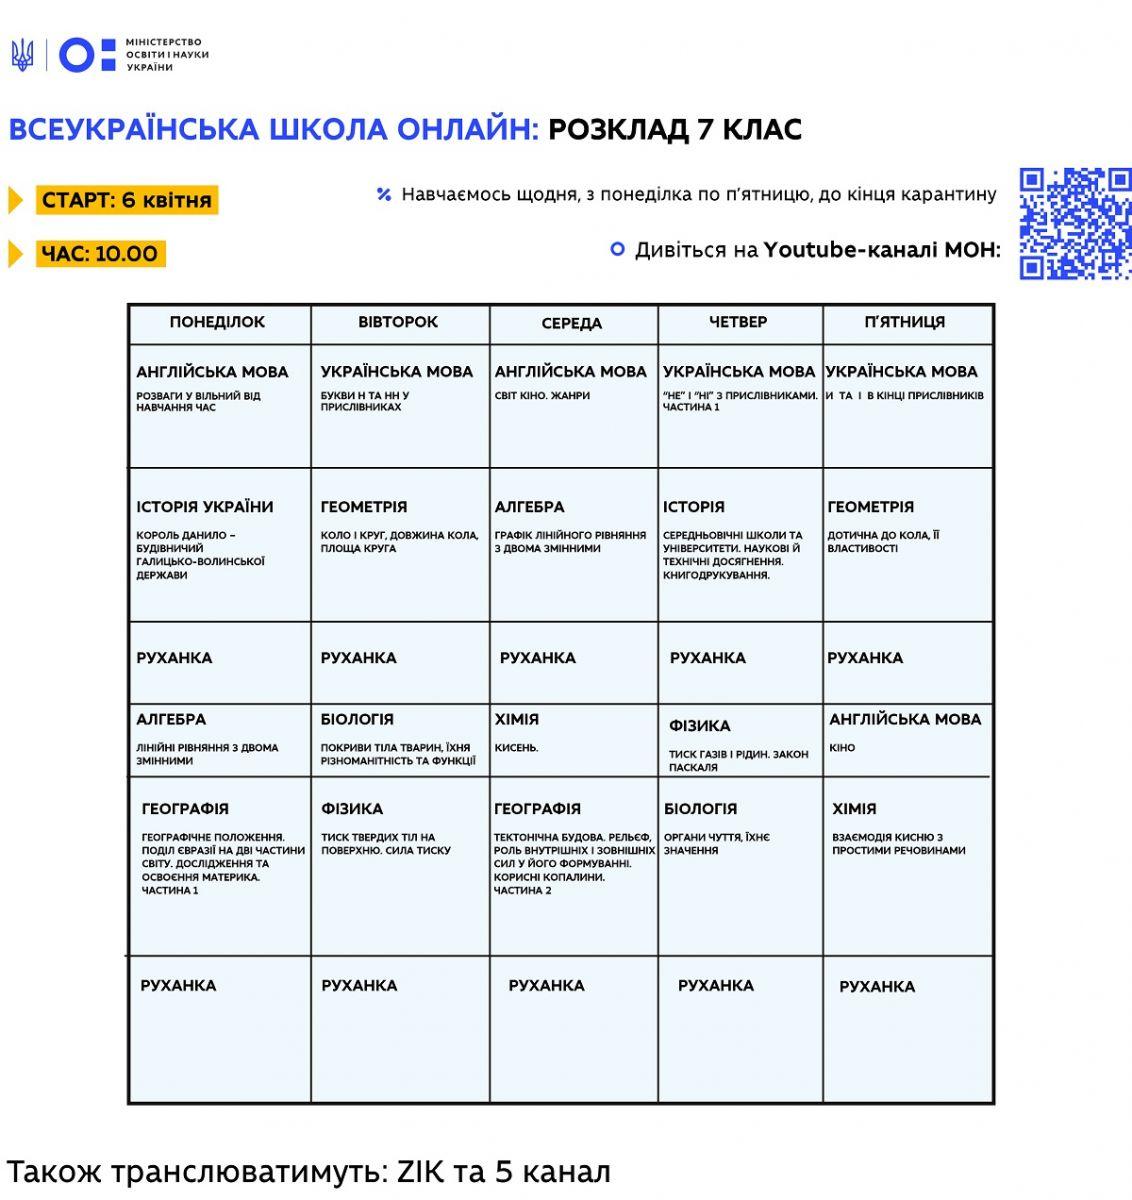 "Расписание уроков онлайн 7 класс: ""Всеукраинская школа онлайн"" / Фото: МОН"